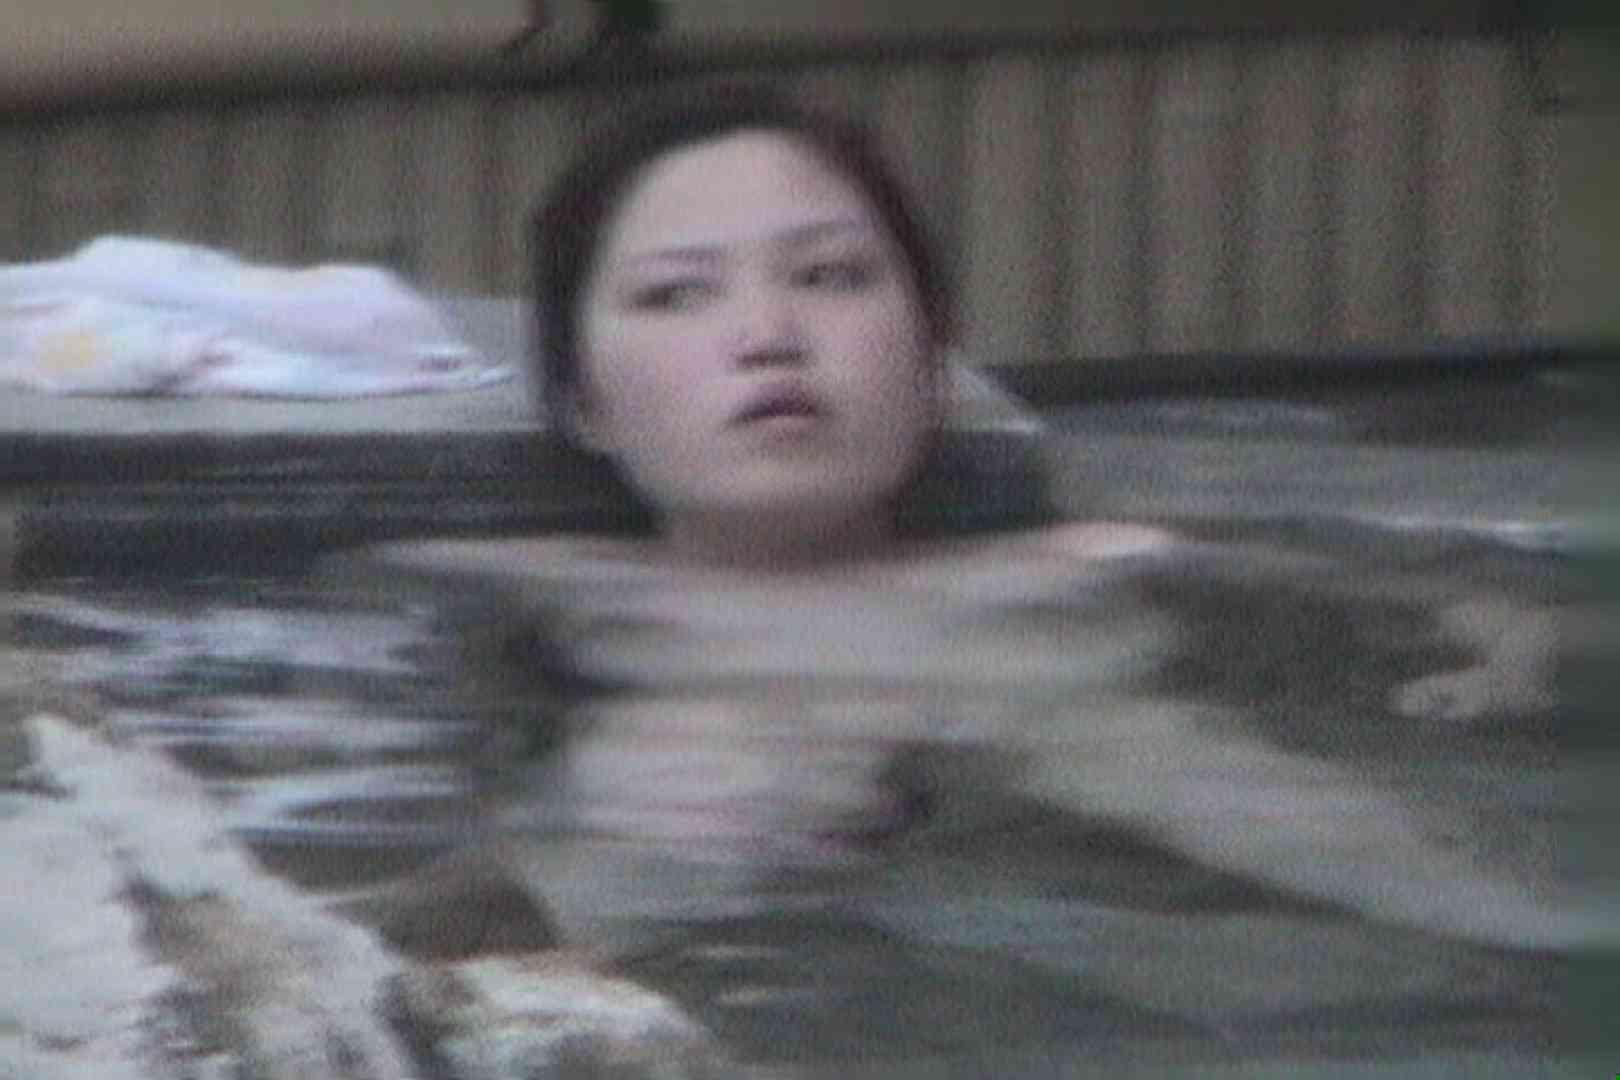 Aquaな露天風呂Vol.602 盗撮師作品  98pic 96